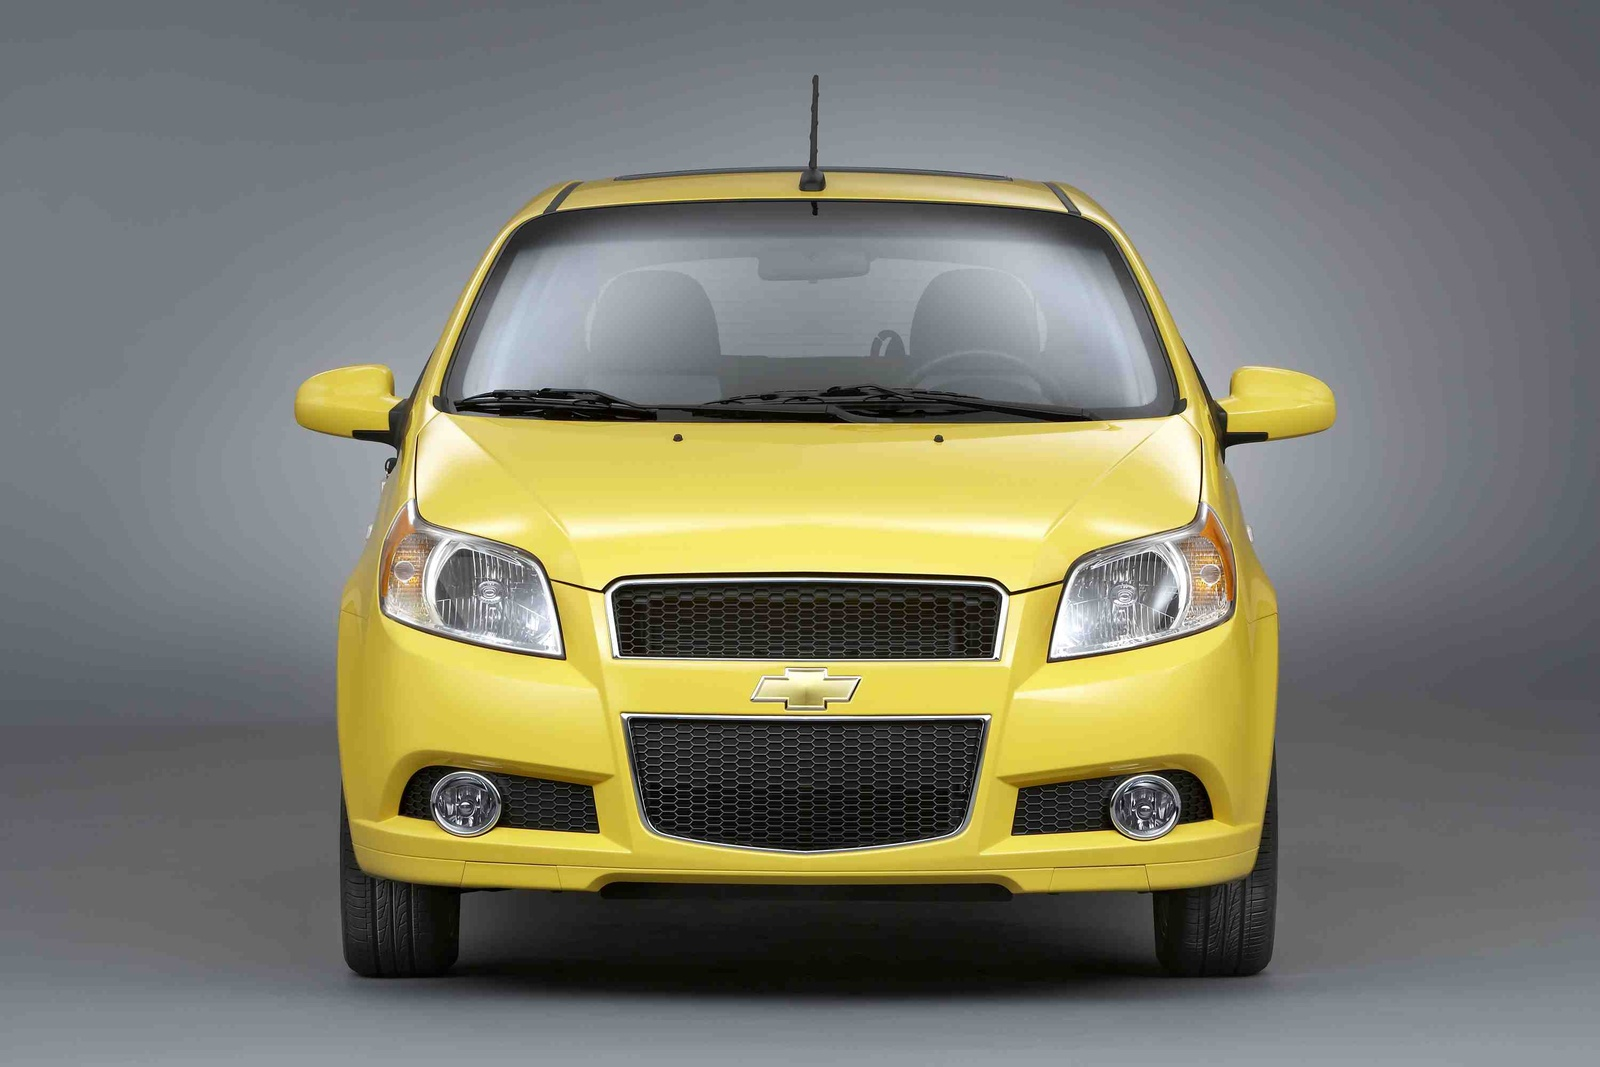 Chevrolet aveo5 lt a true professional 2010